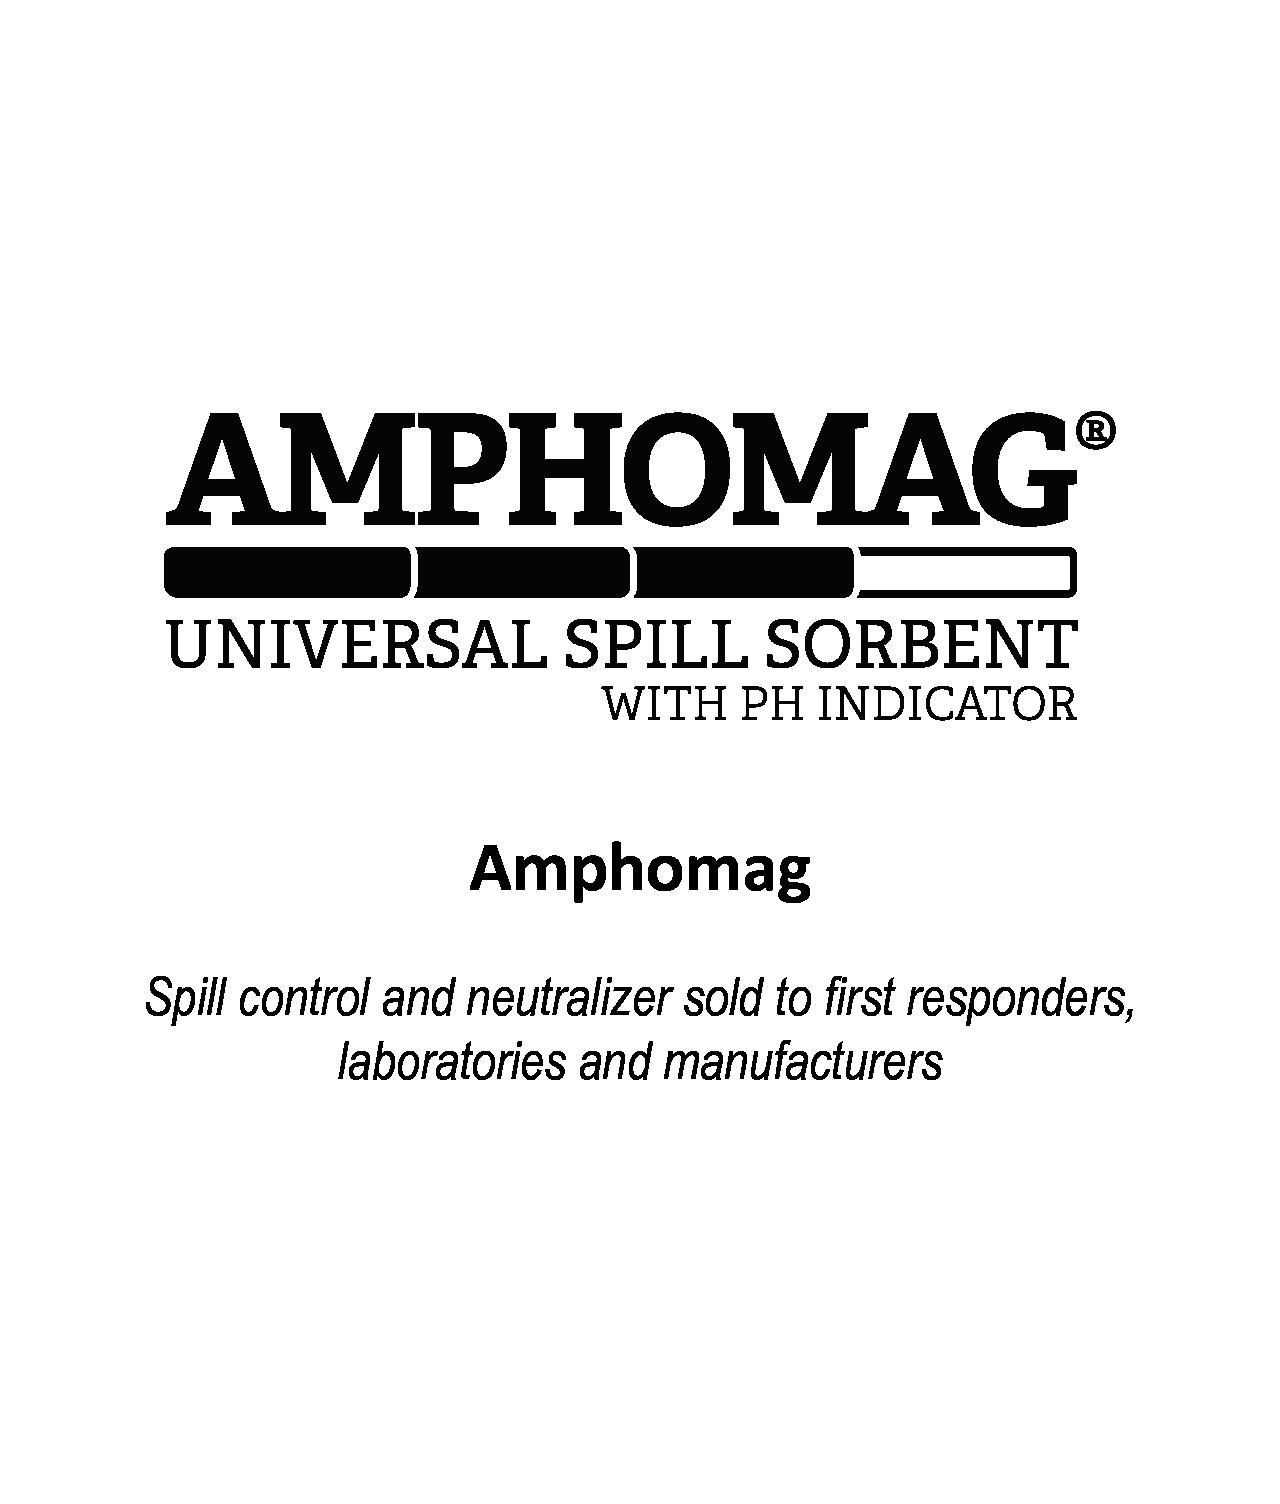 Amphomag